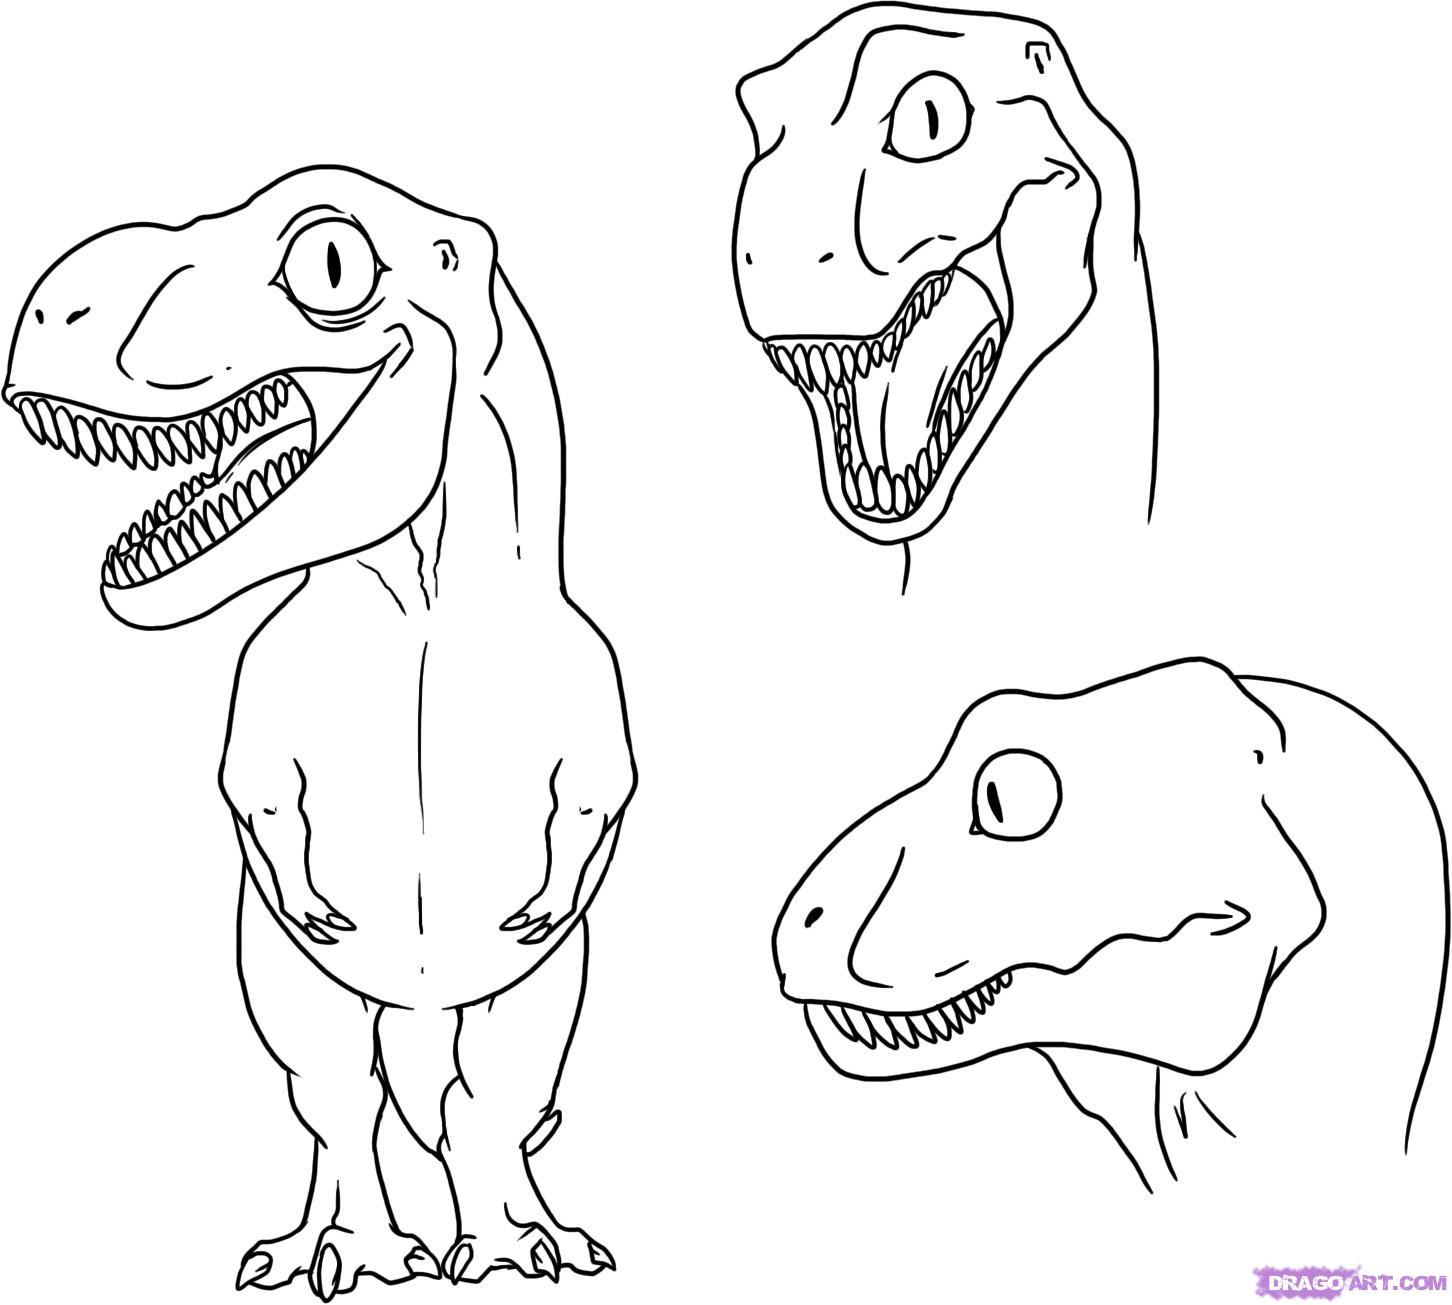 Drawn dinosaur A Draw dinosaur to draw